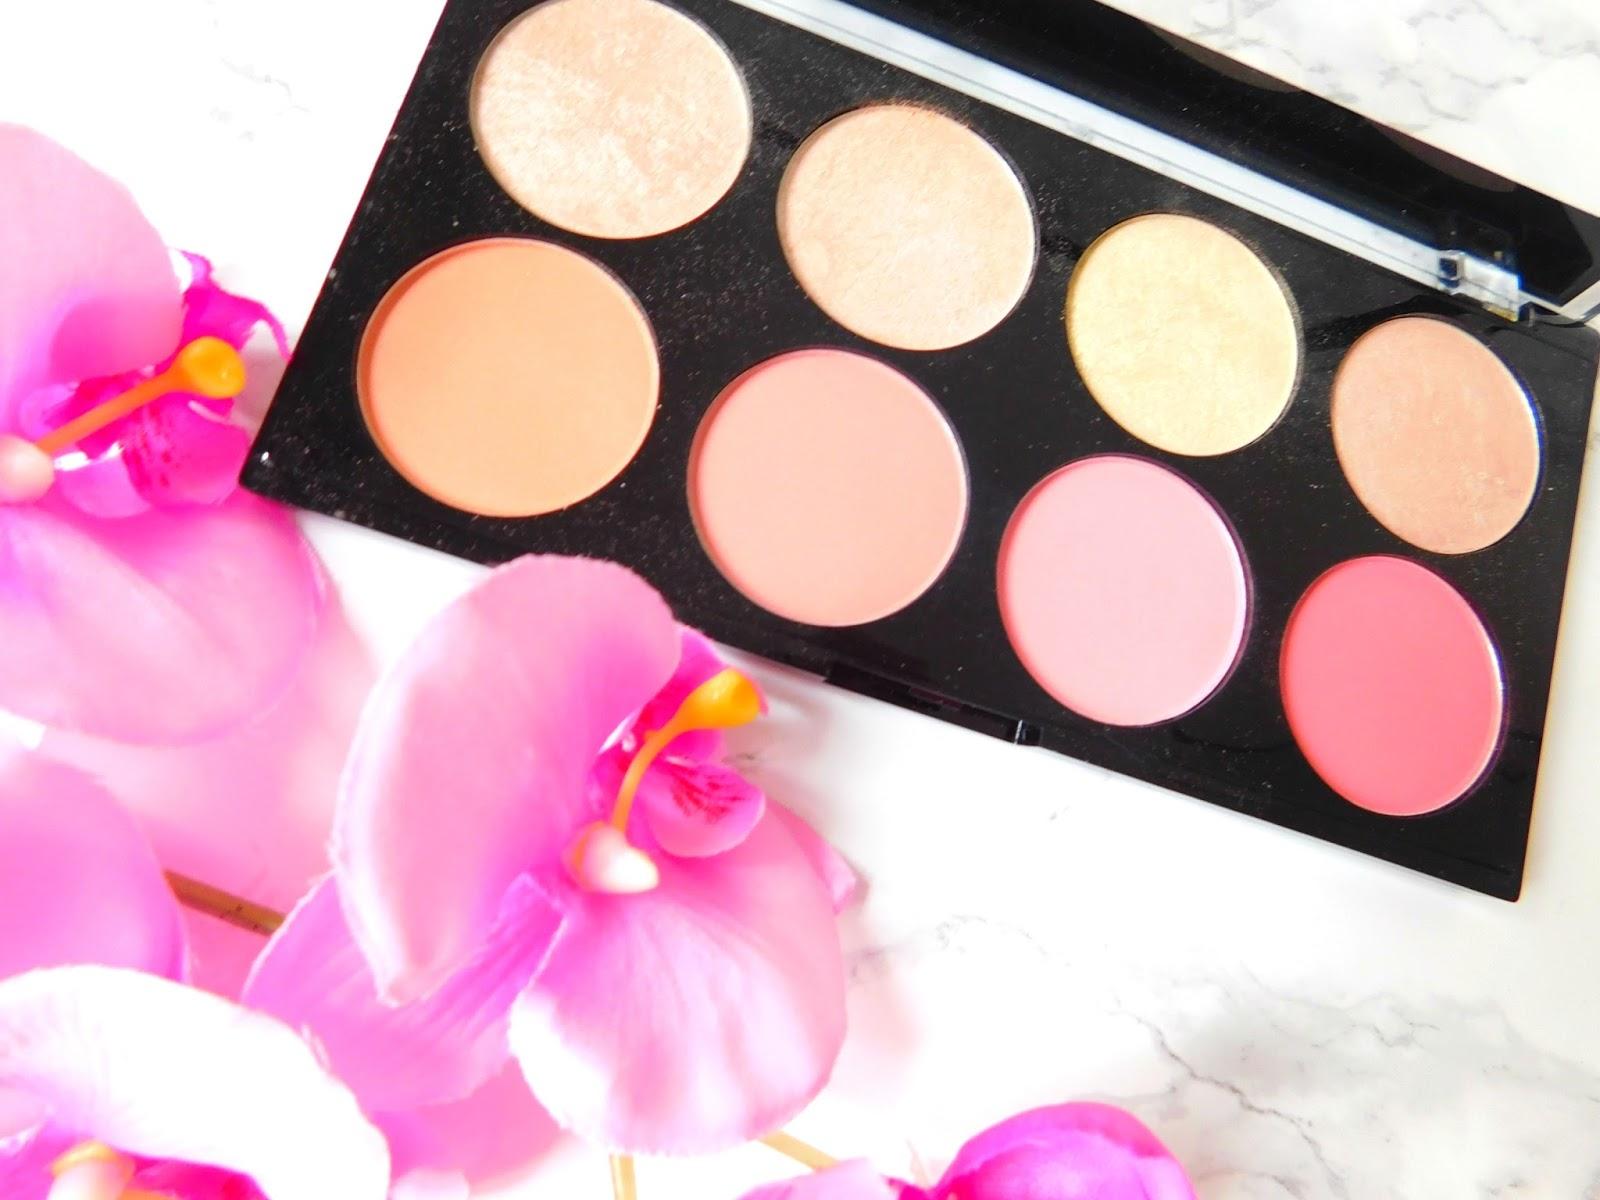 Makeup Revolution Blush Palette in Blush Goddess